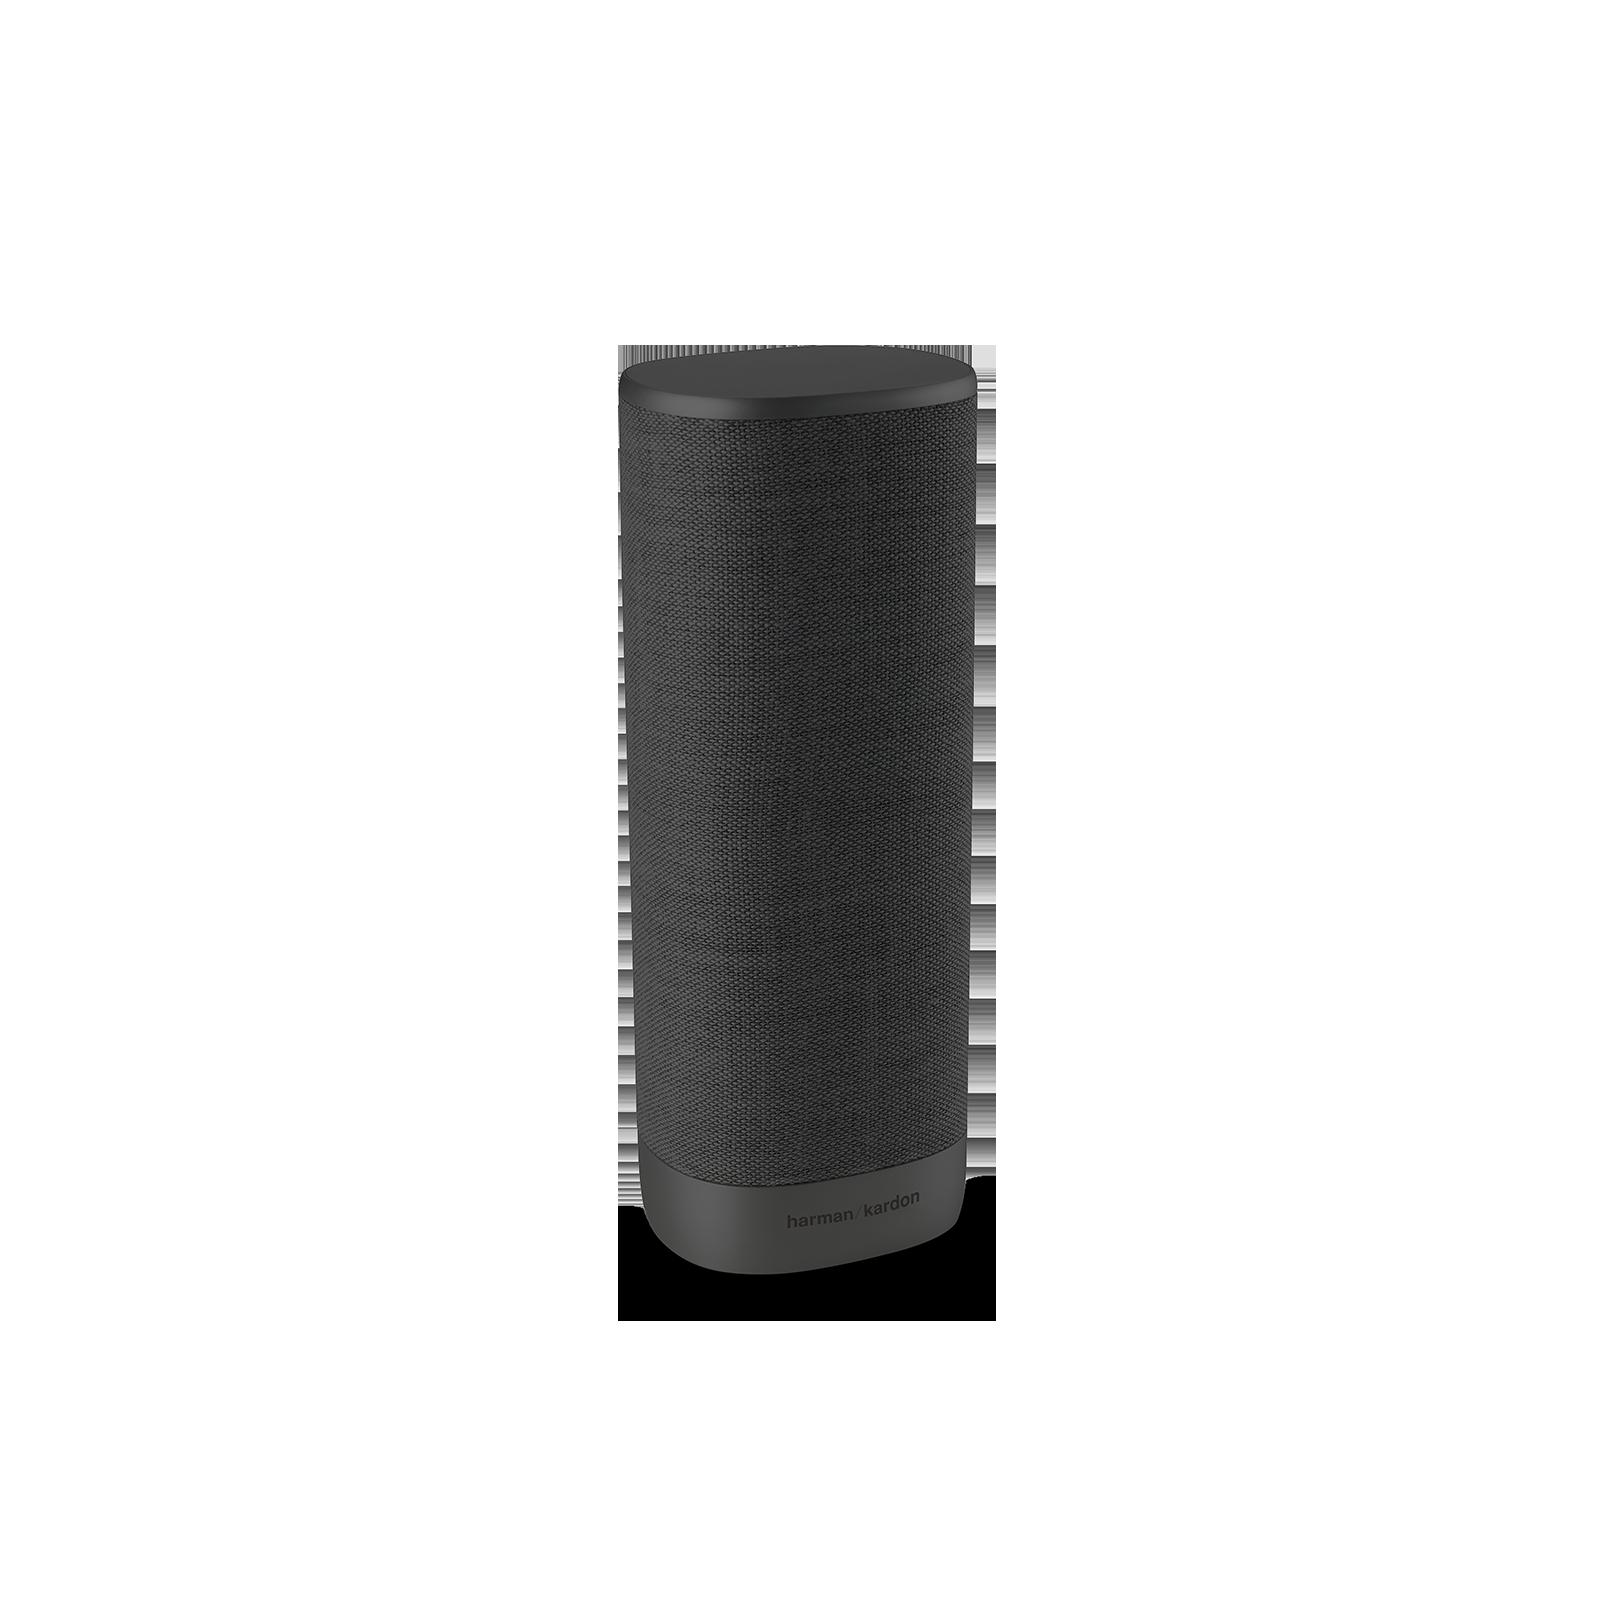 Harman Kardon Citation Surround - Black - Surround sound for immersive movie experience - Left